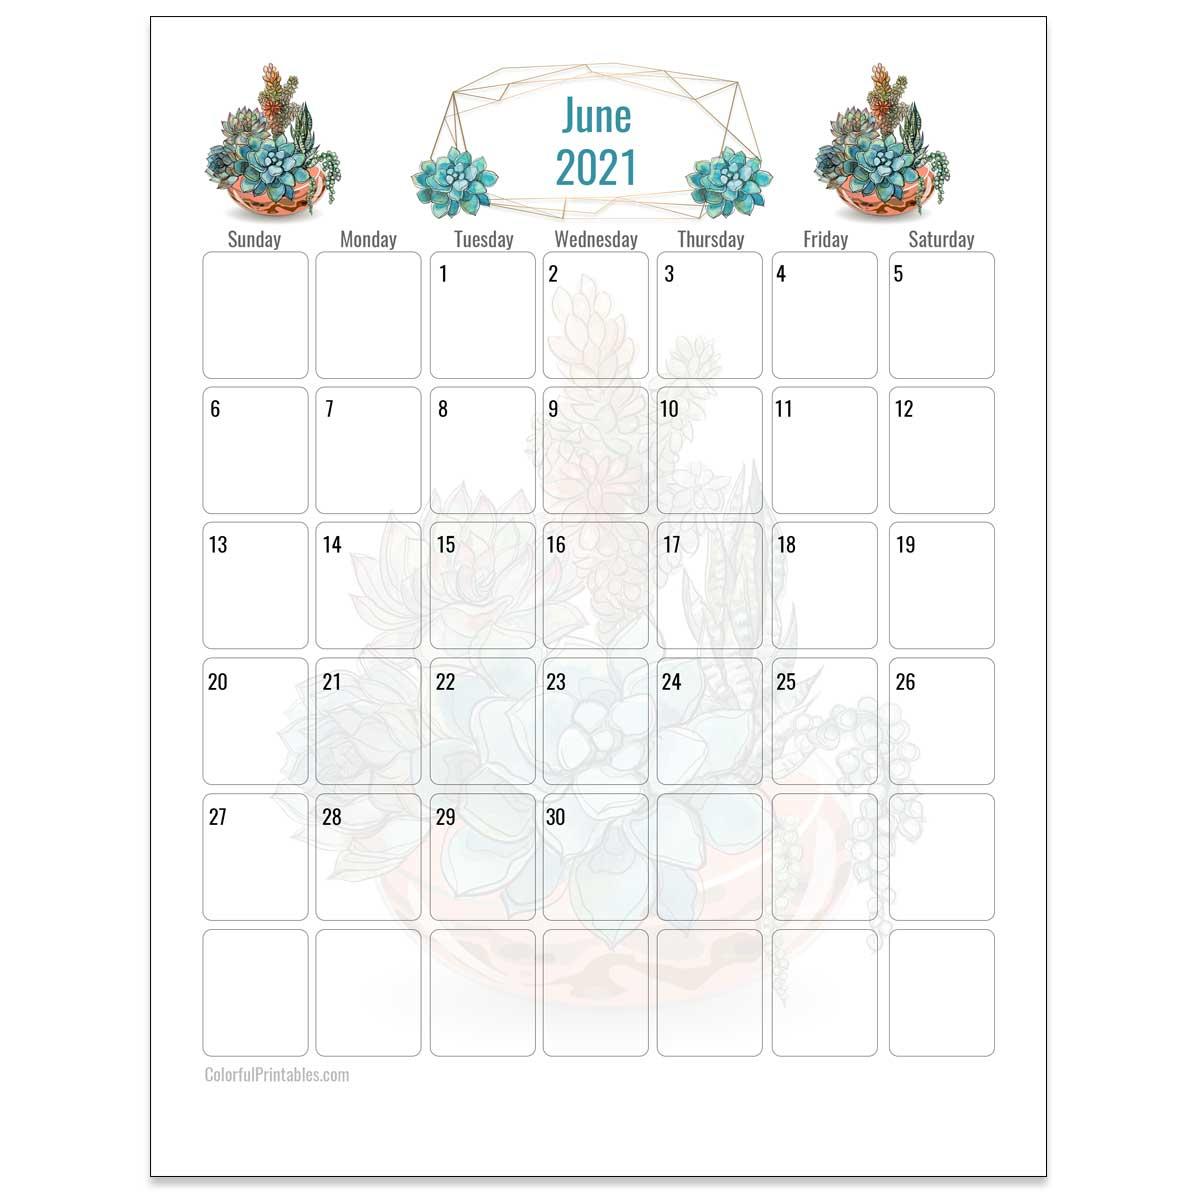 June Succulent calendar